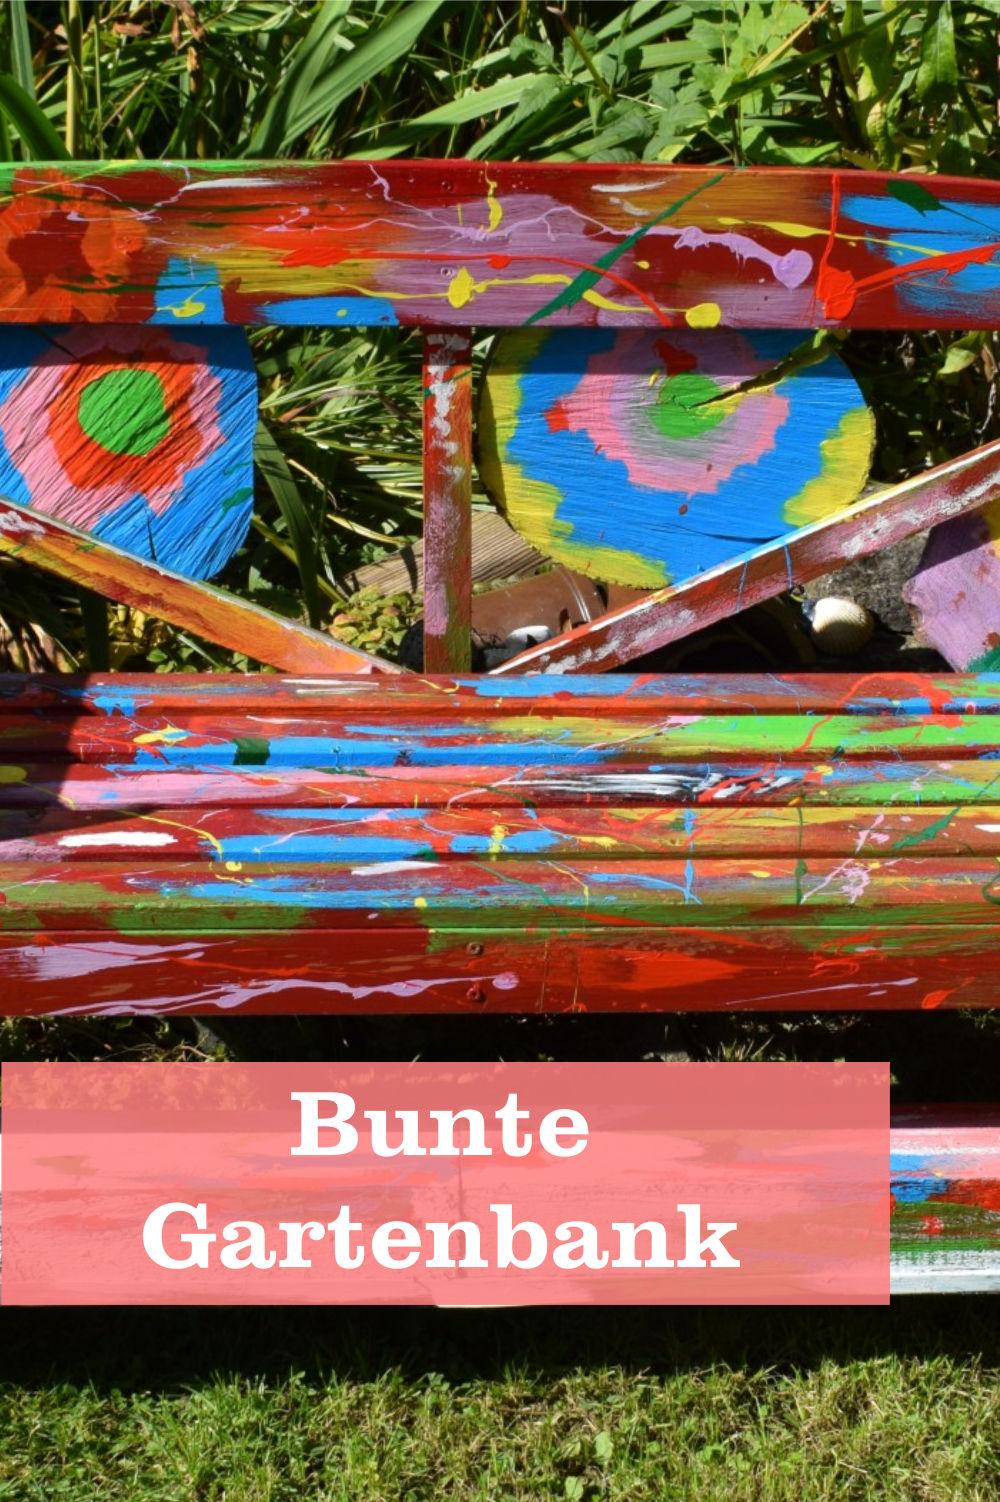 Bunte Gartenbank